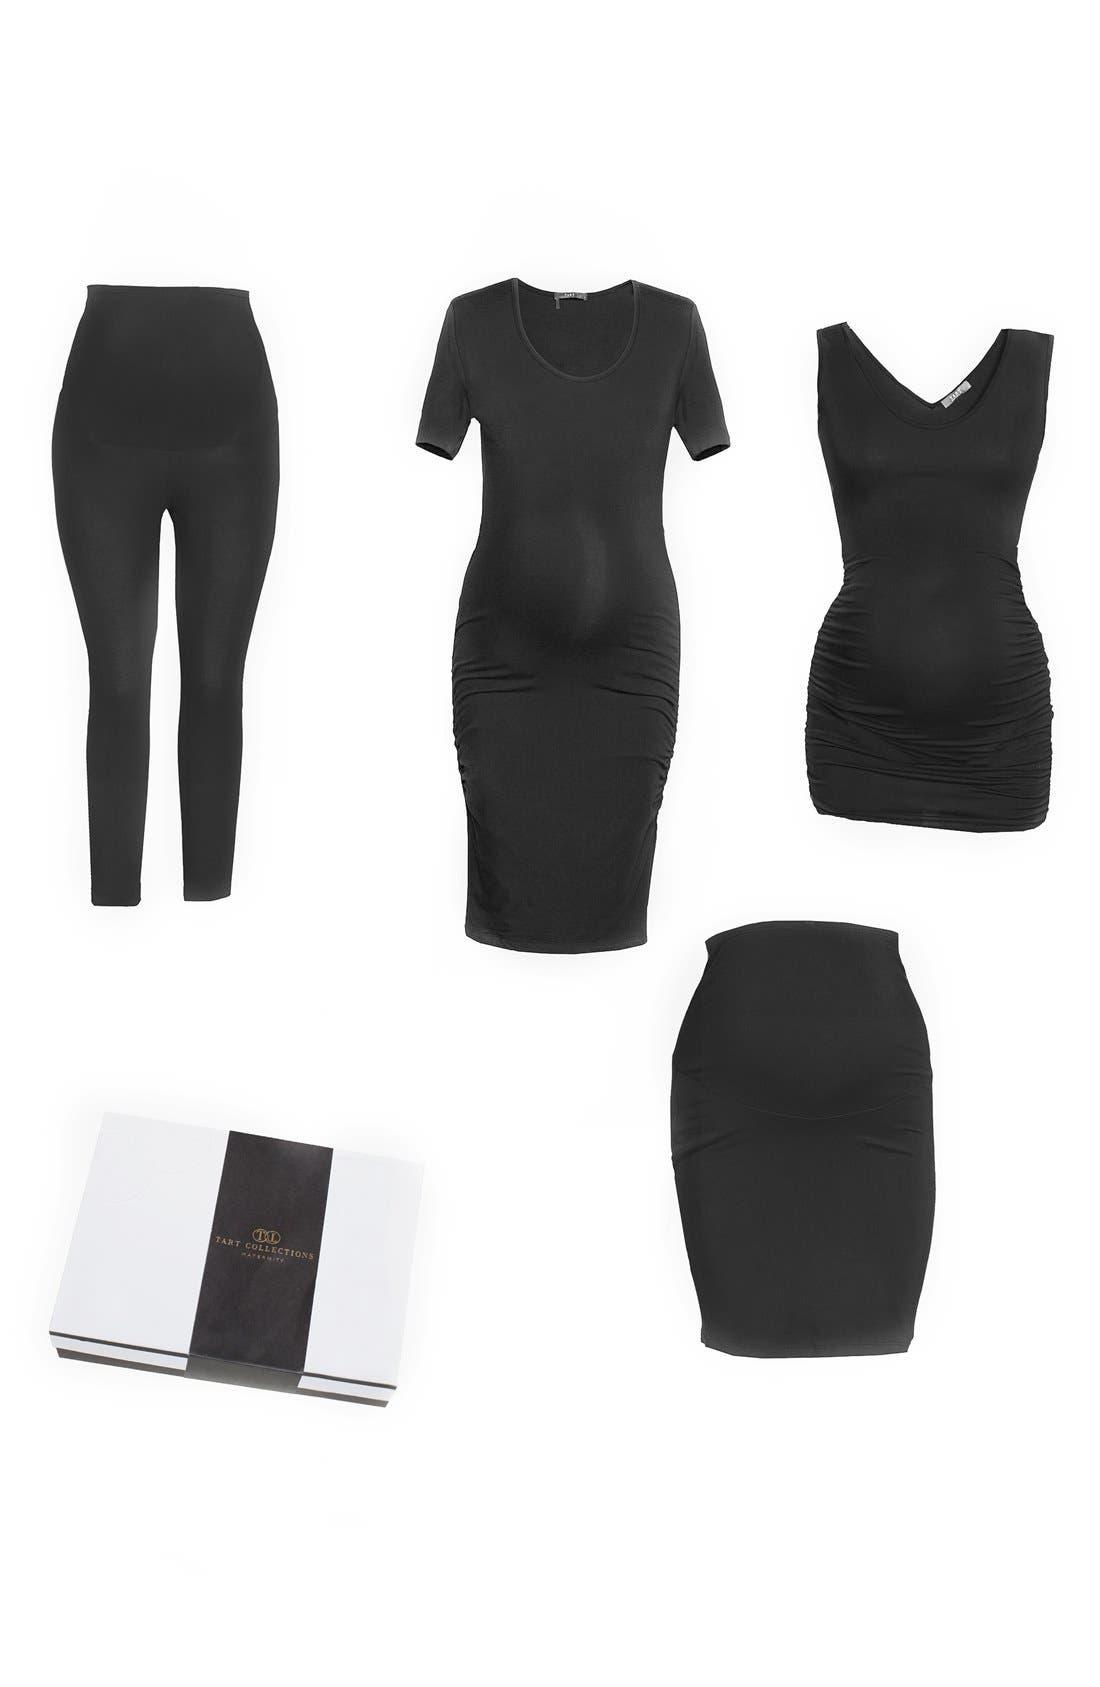 Main Image - Tart Maternity Essentials Four-Piece Starter Kit